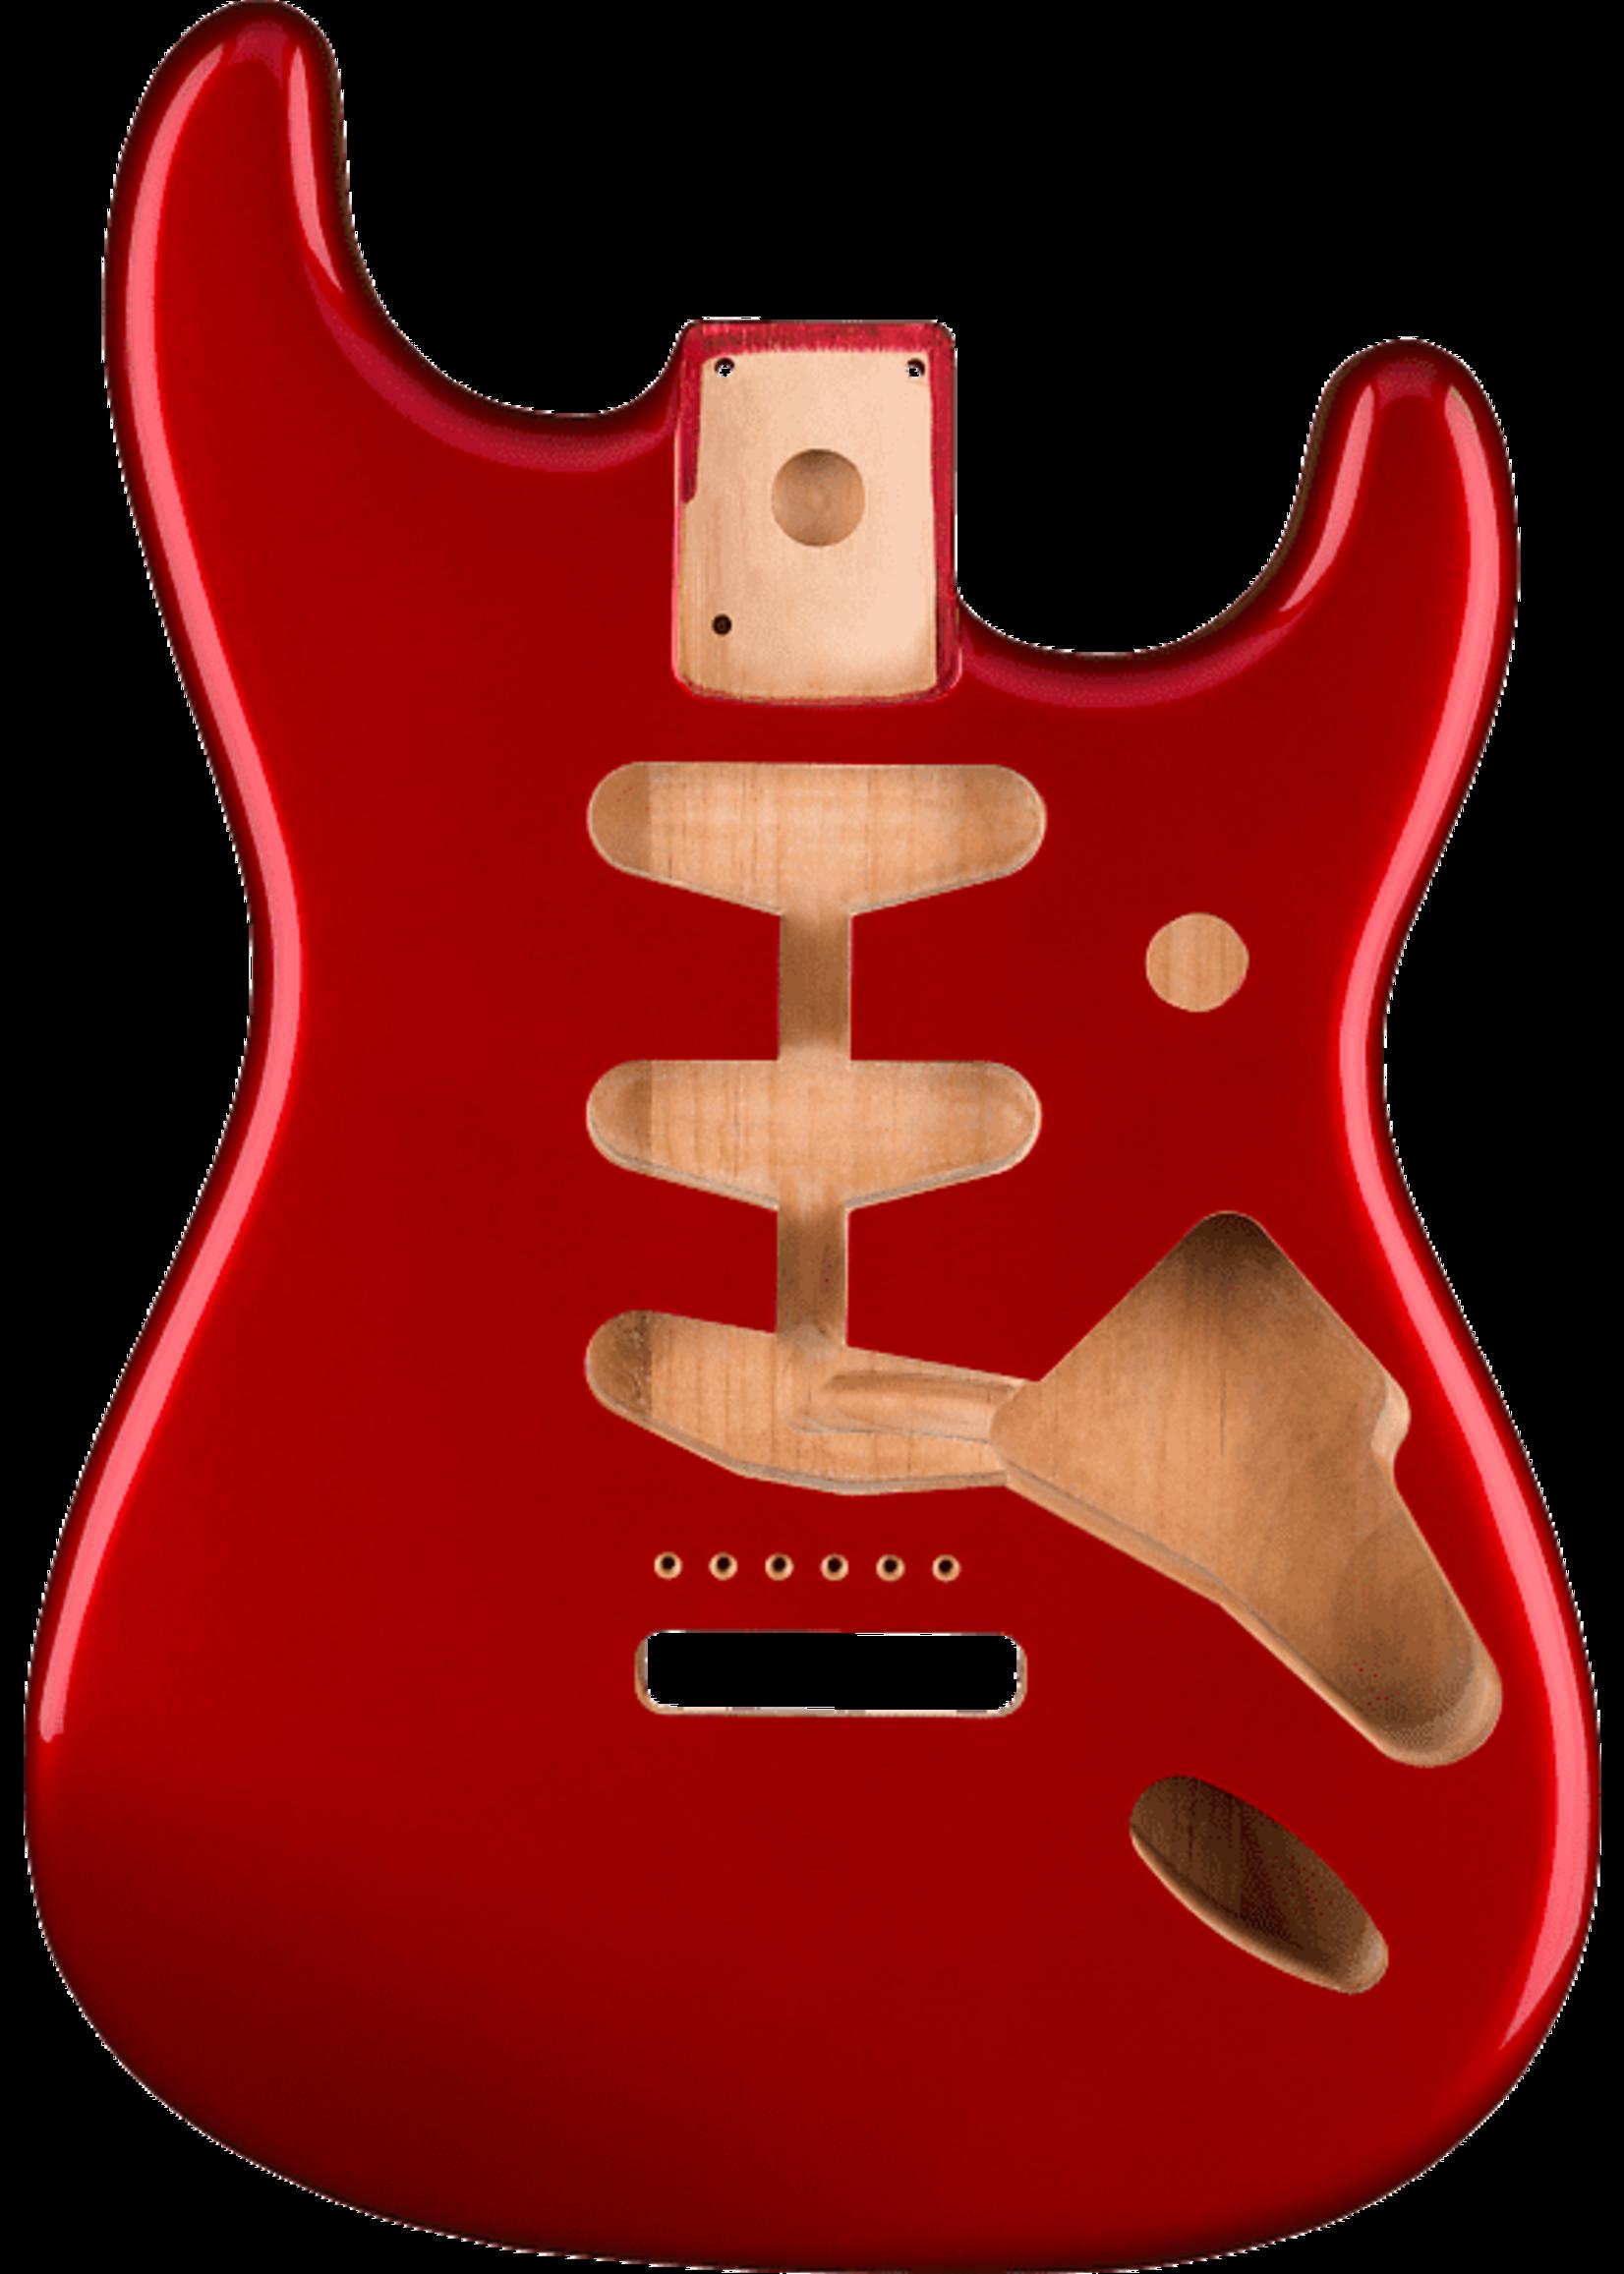 Fender Fender Classic Series 60's Stratocaster® SSS Alder Body Vintage Bridge Mount, Candy Apple Red